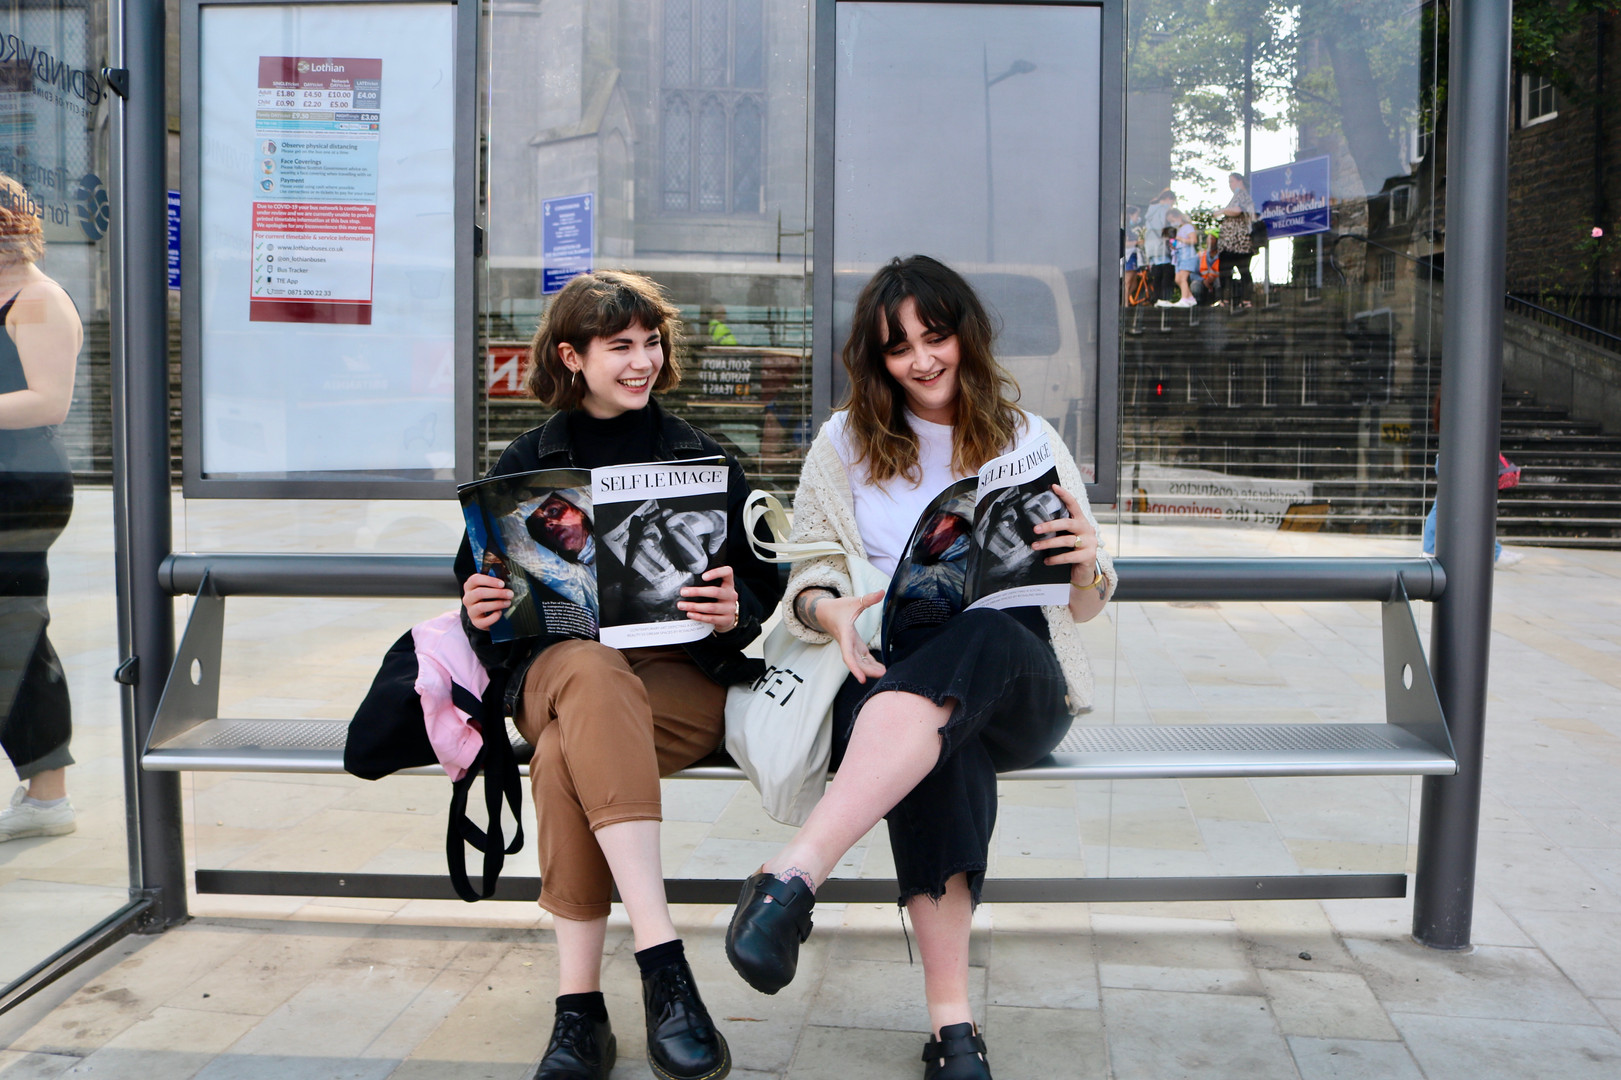 SELF I.E IMAGE MAGAZINE at the bus stop